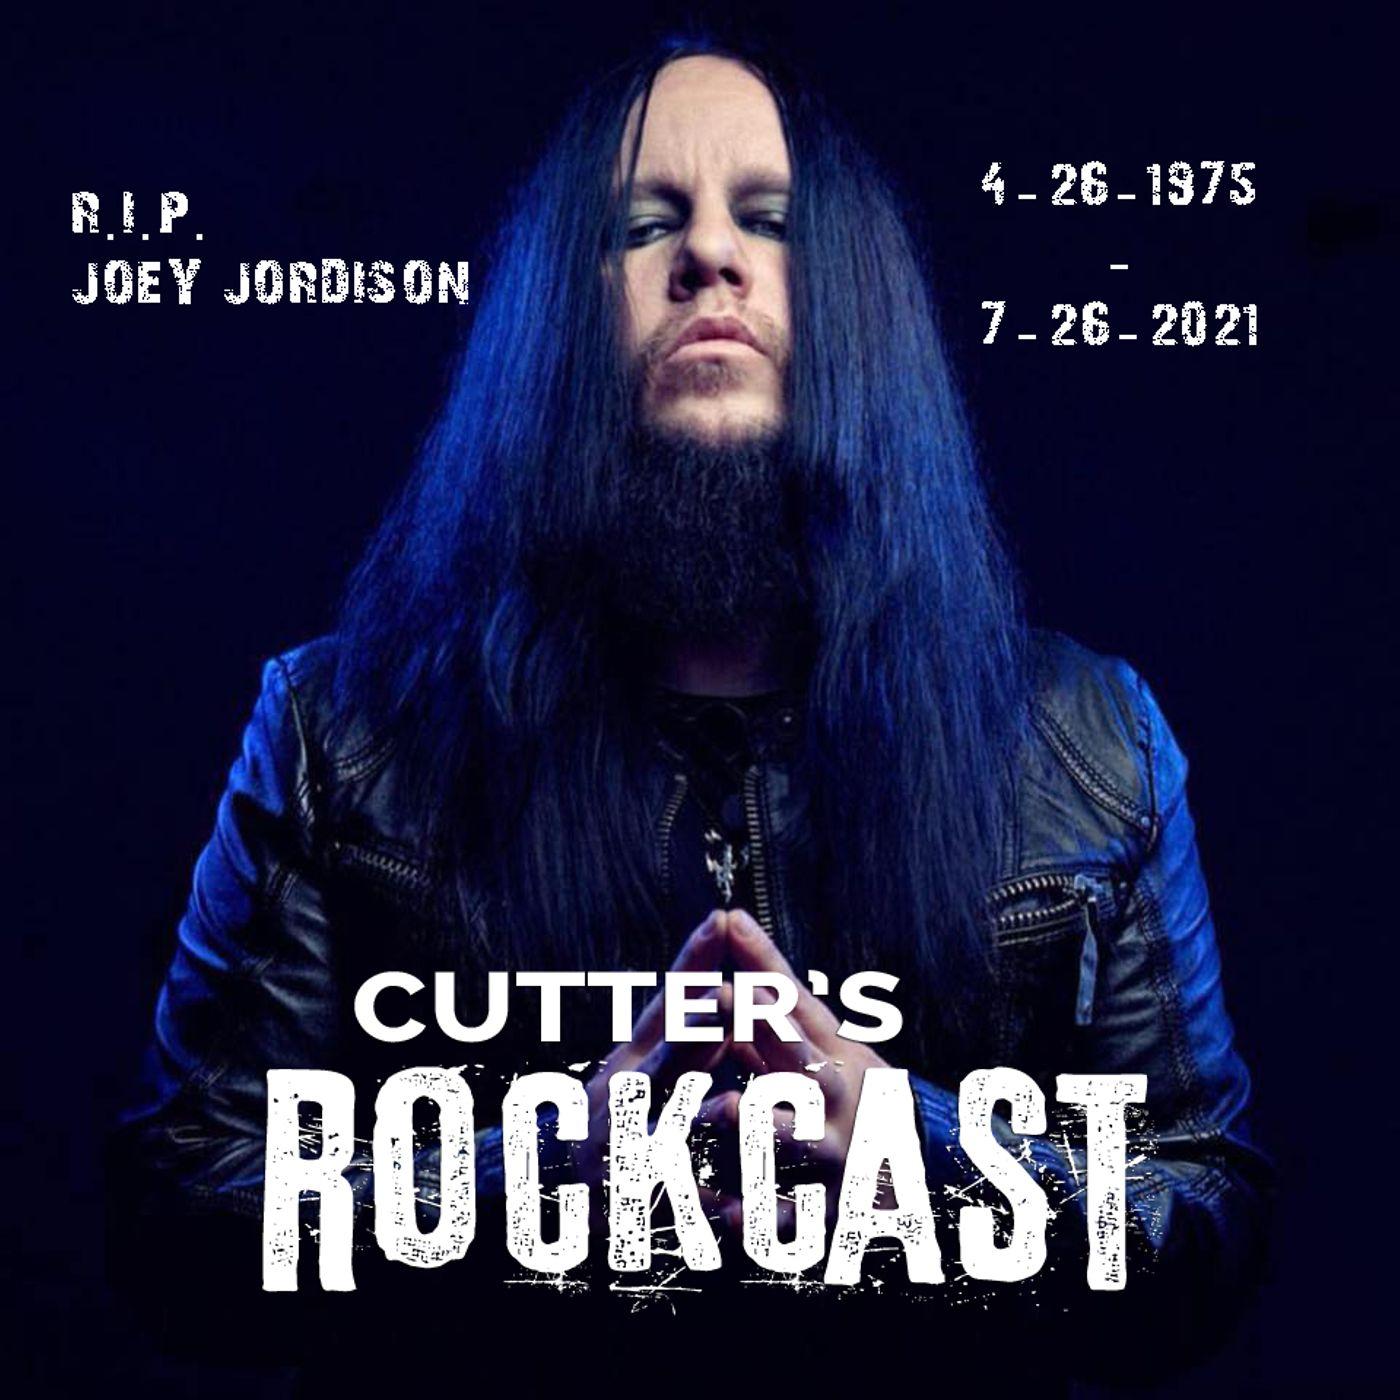 Rockcast 243 - An Archival Conversation with Joey Jordison